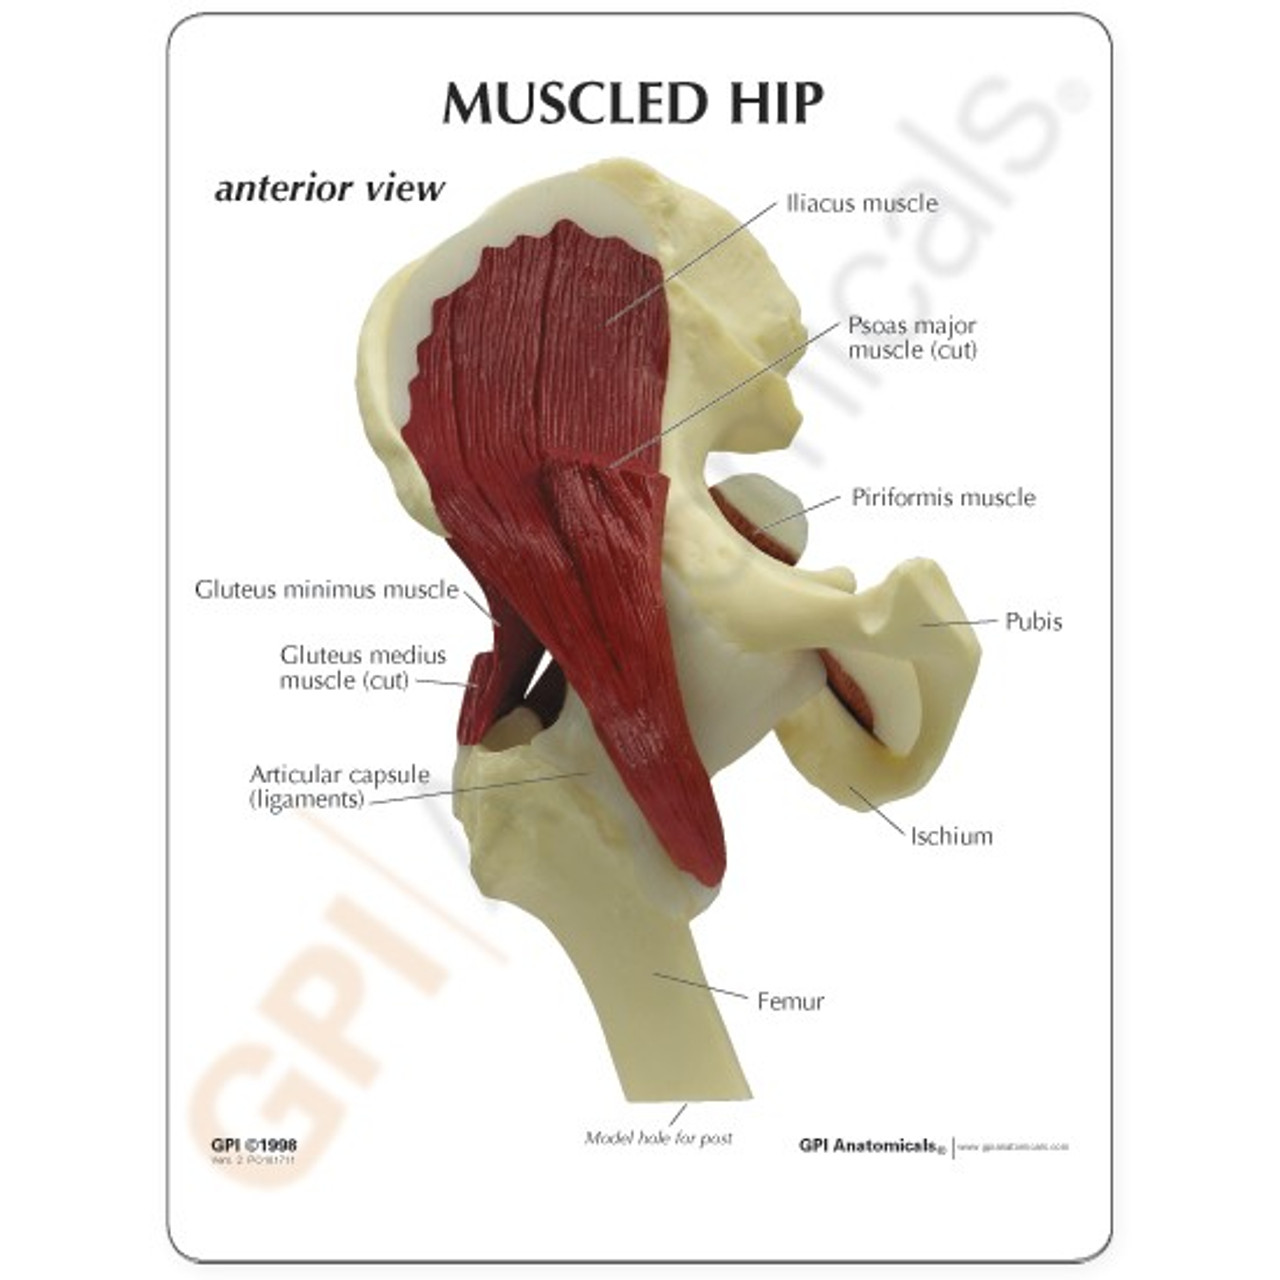 Hip Muscled Anatomical Model Description Card